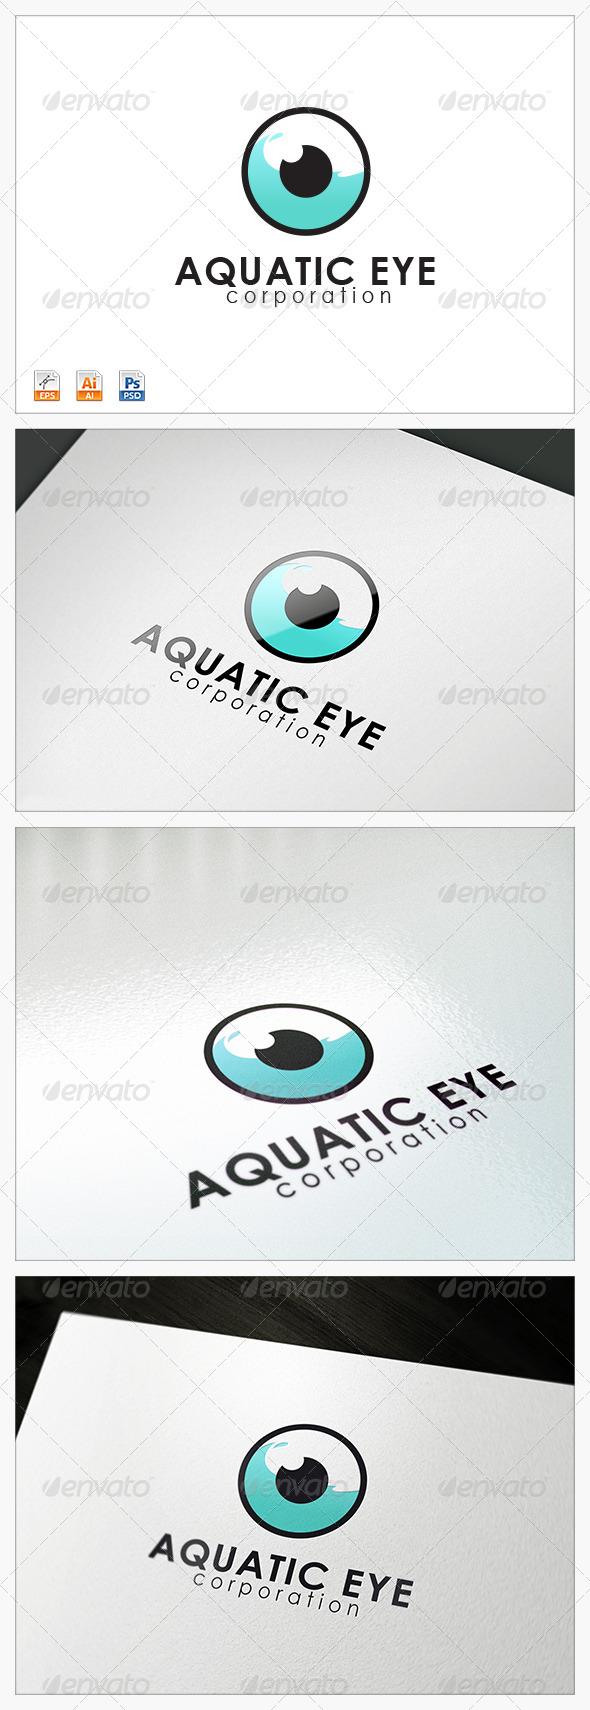 GraphicRiver Aquatic Eye logo 3765600